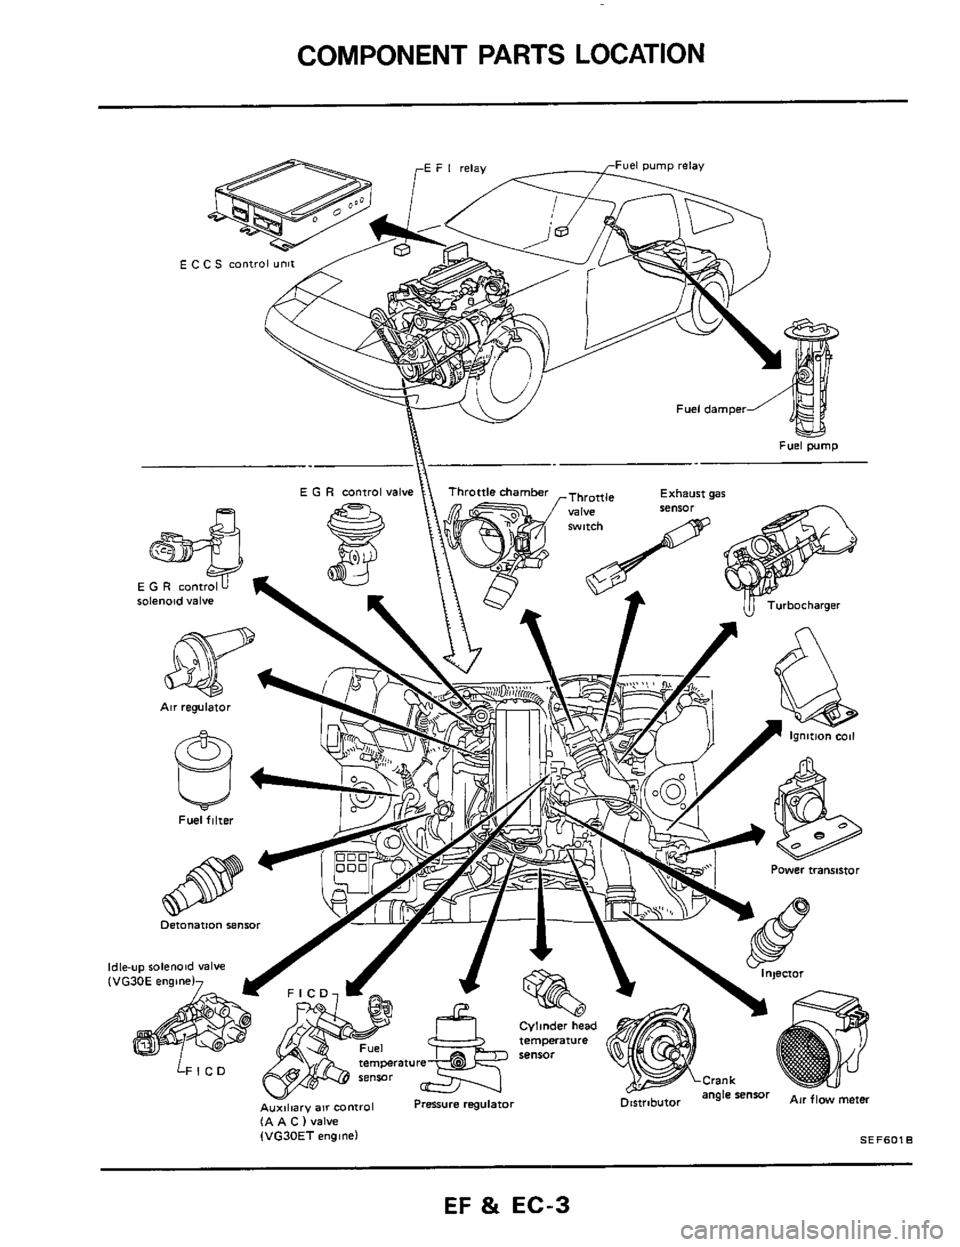 Nissan 300zx 1984 z31 engine fuel and emission control system workshop manual